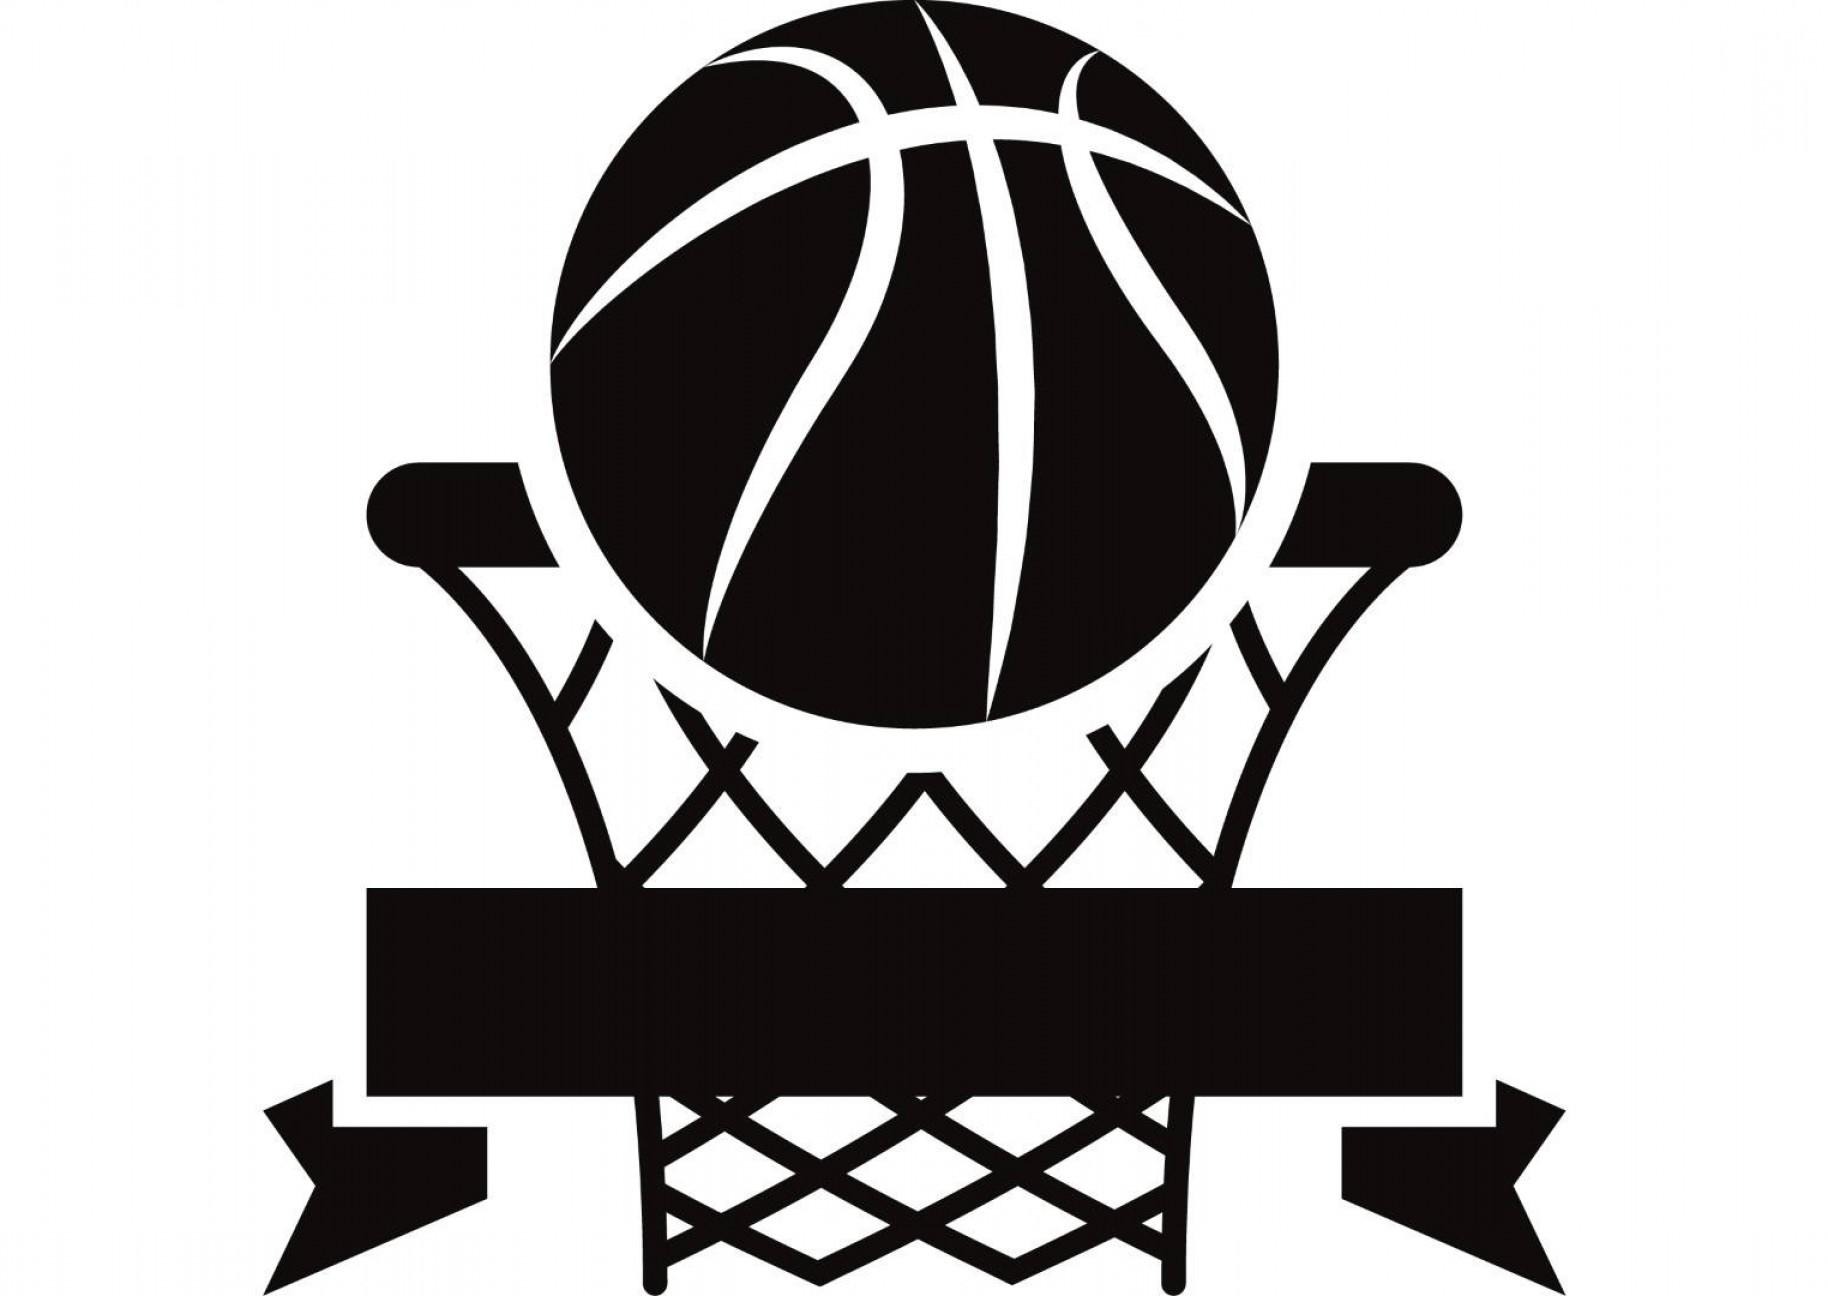 Basketball Logo Vector at GetDrawings | Free download